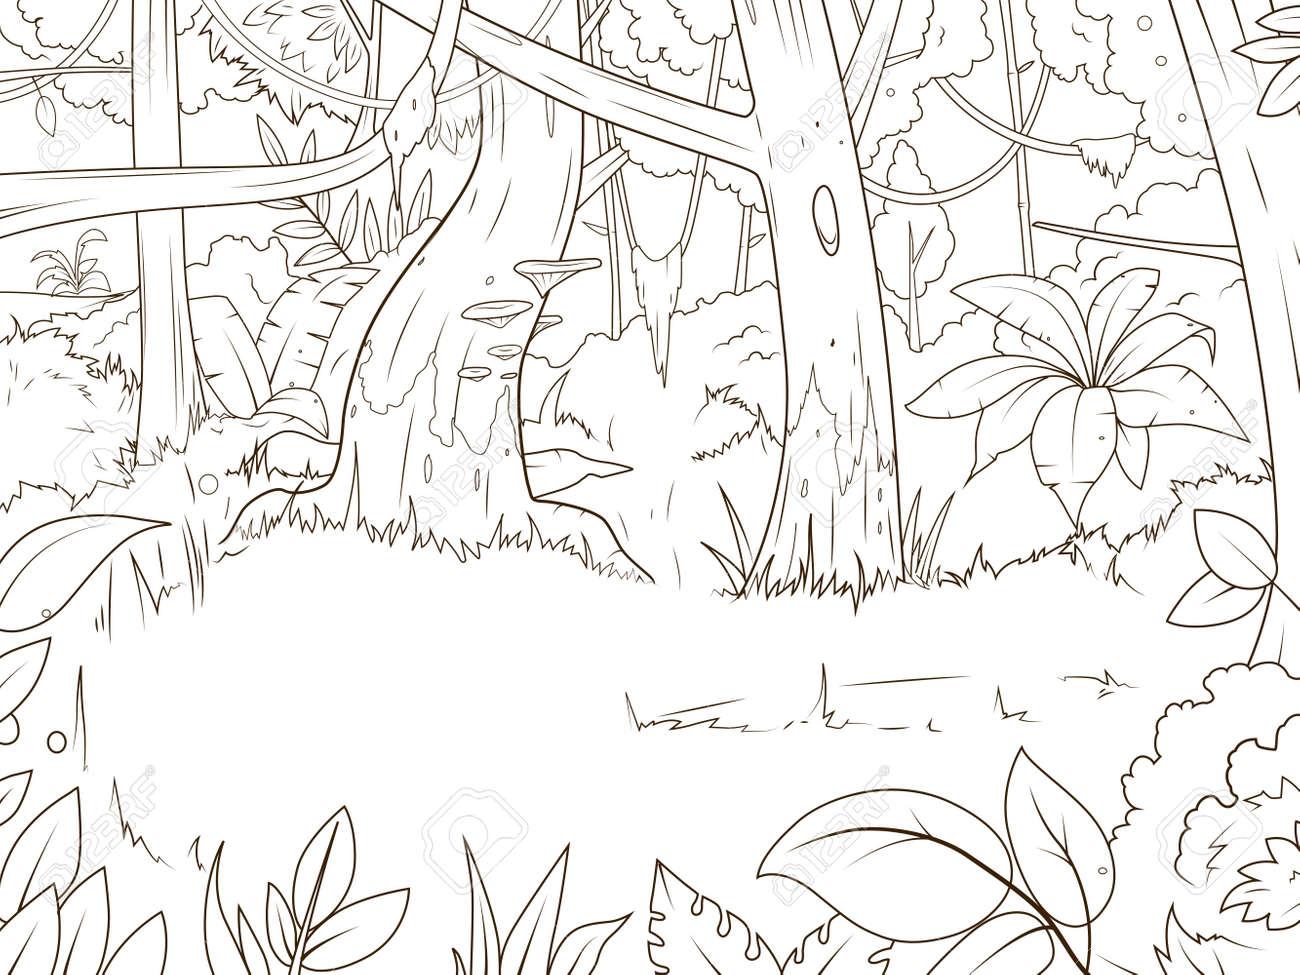 Dibujo Animado Bosque Selva Ilustración Vectorial Libro Para